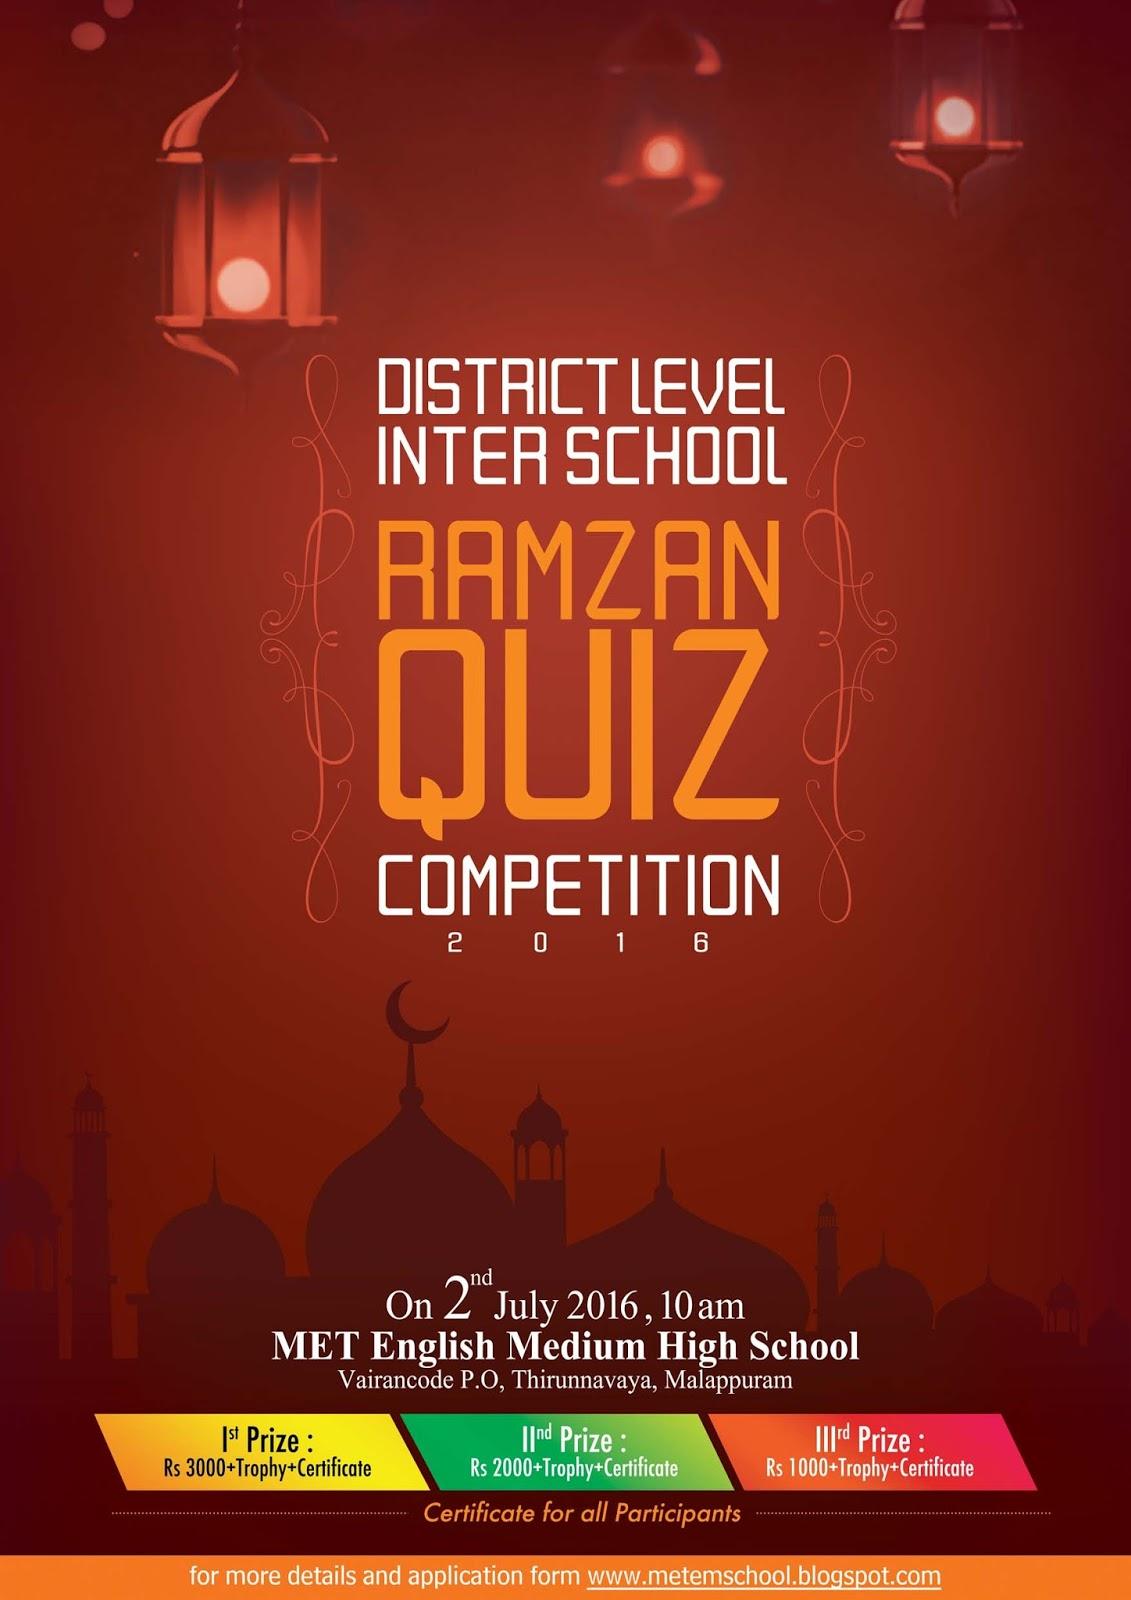 M E T English Medium High School,Kazhuthakkara: Inter School